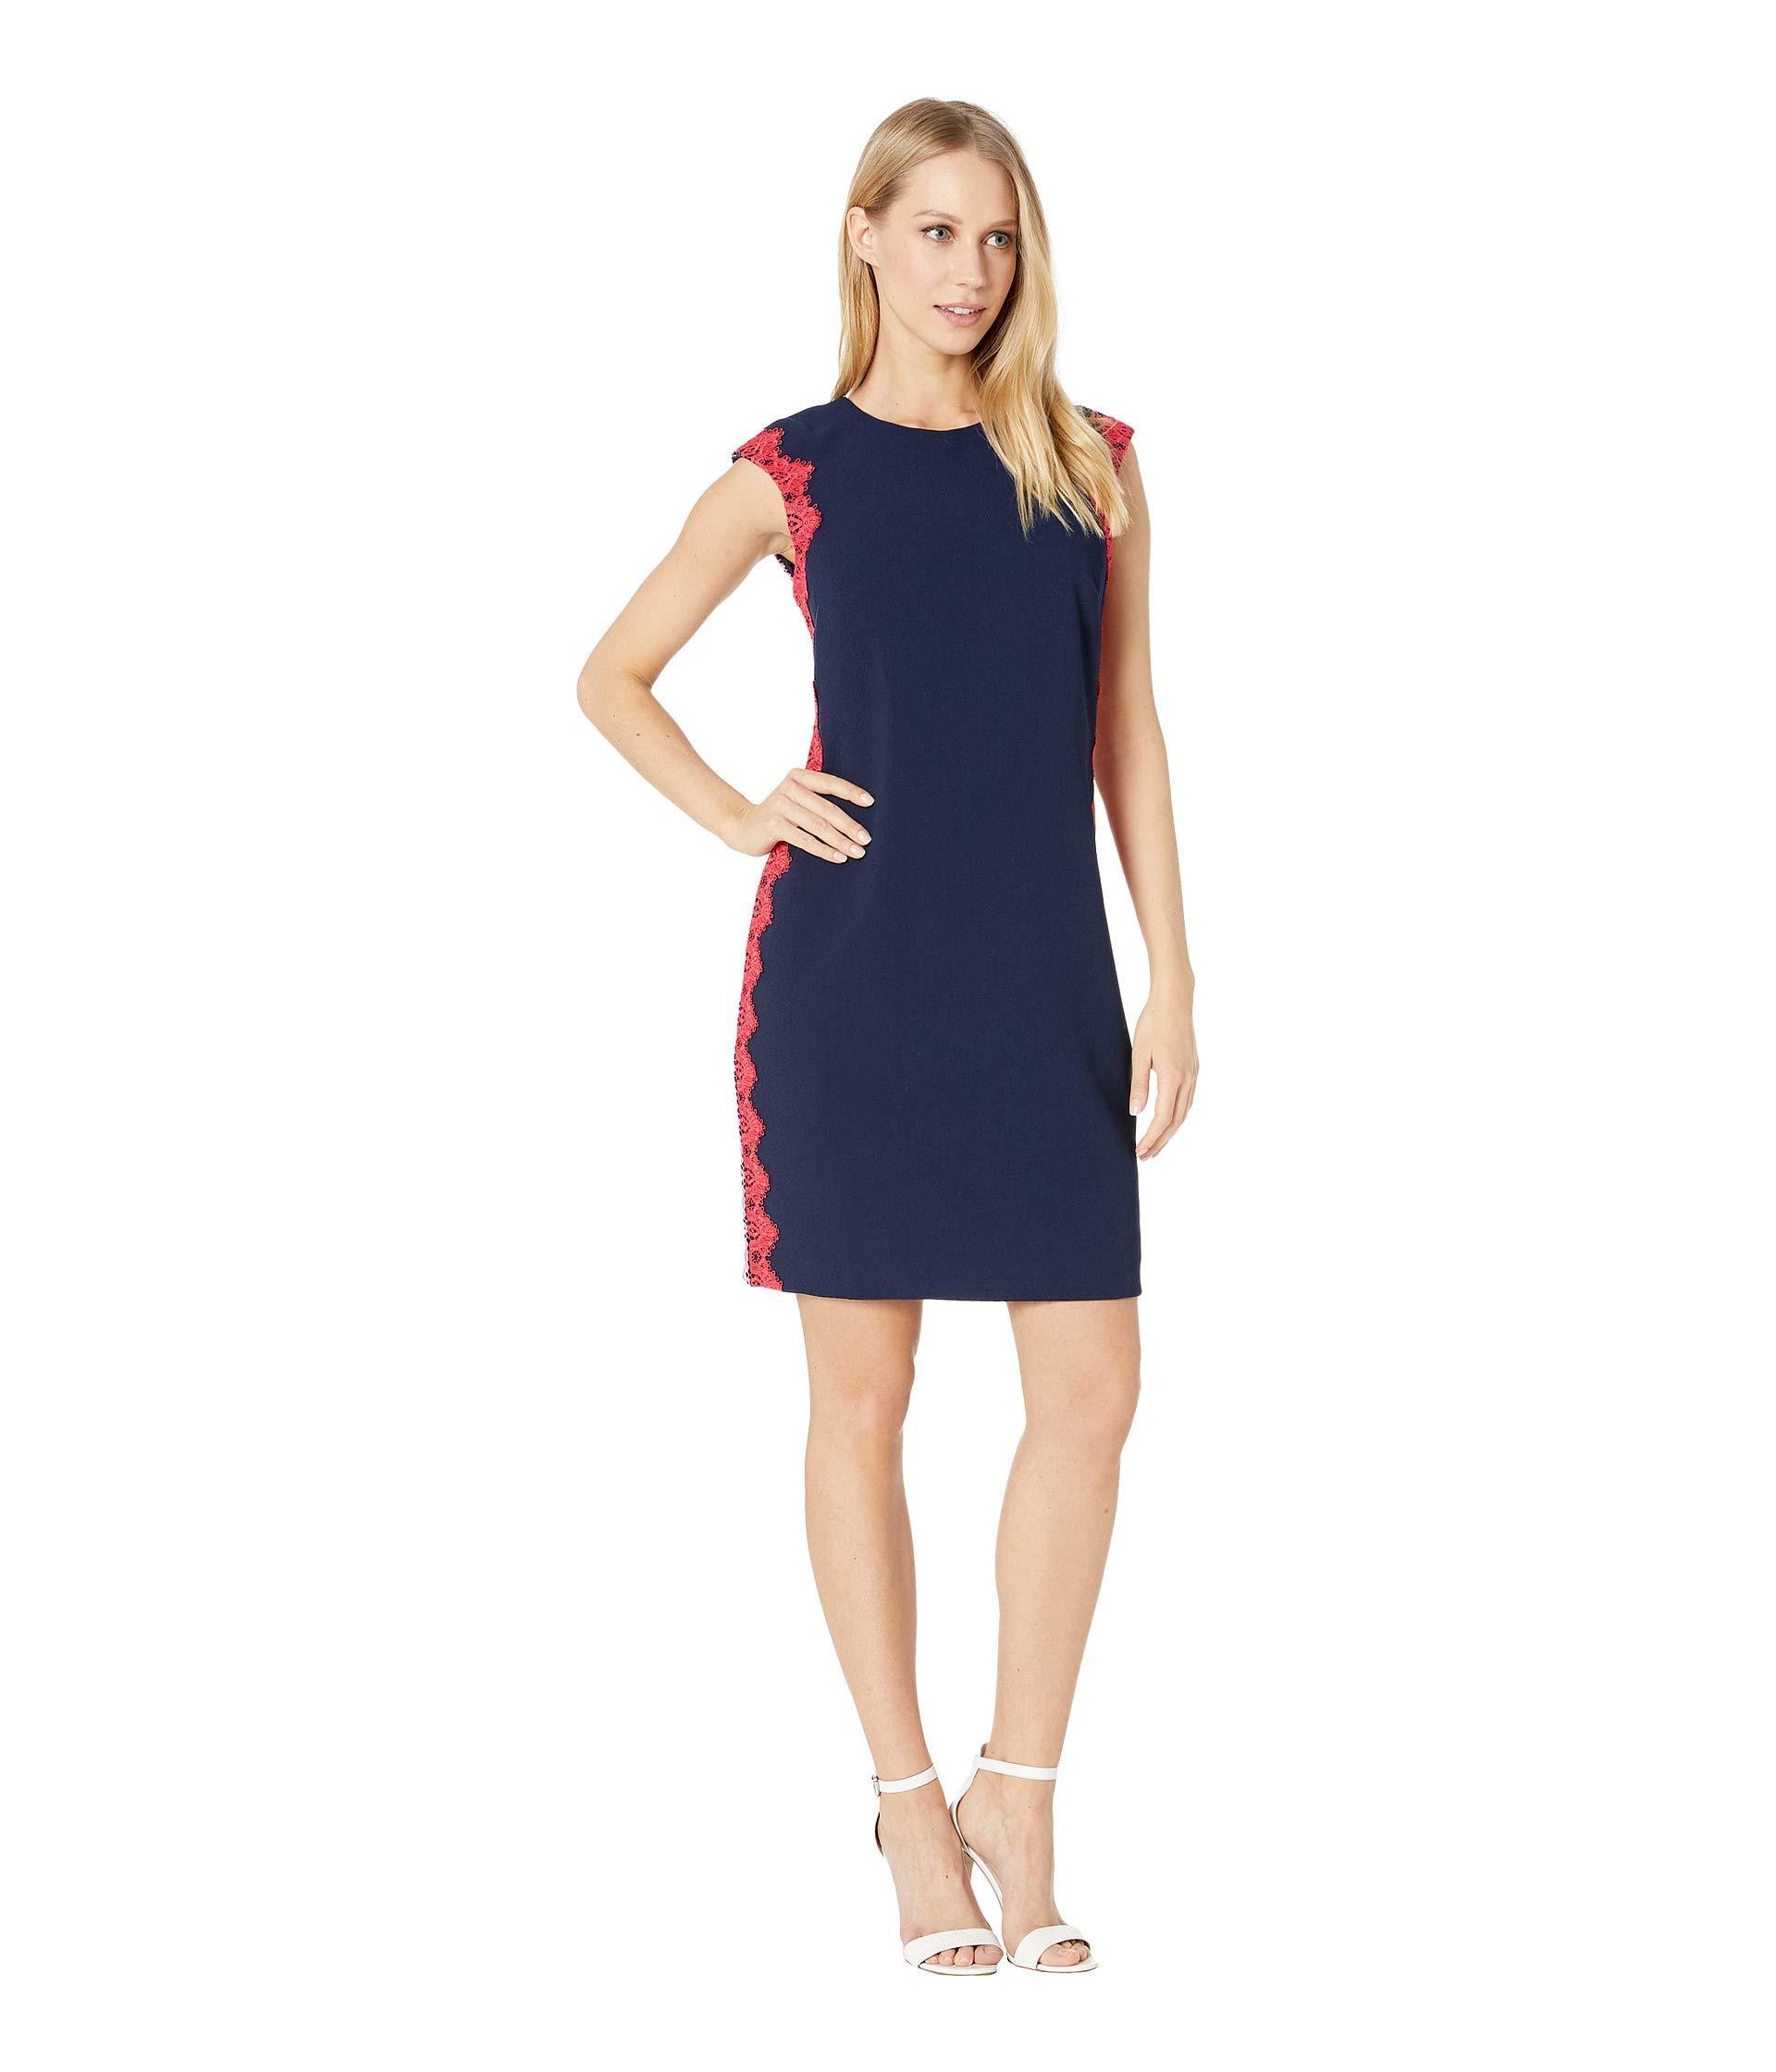 Lyst - Trina Turk Whim Dress (indigo) Women s Dress in Blue 033797ba9